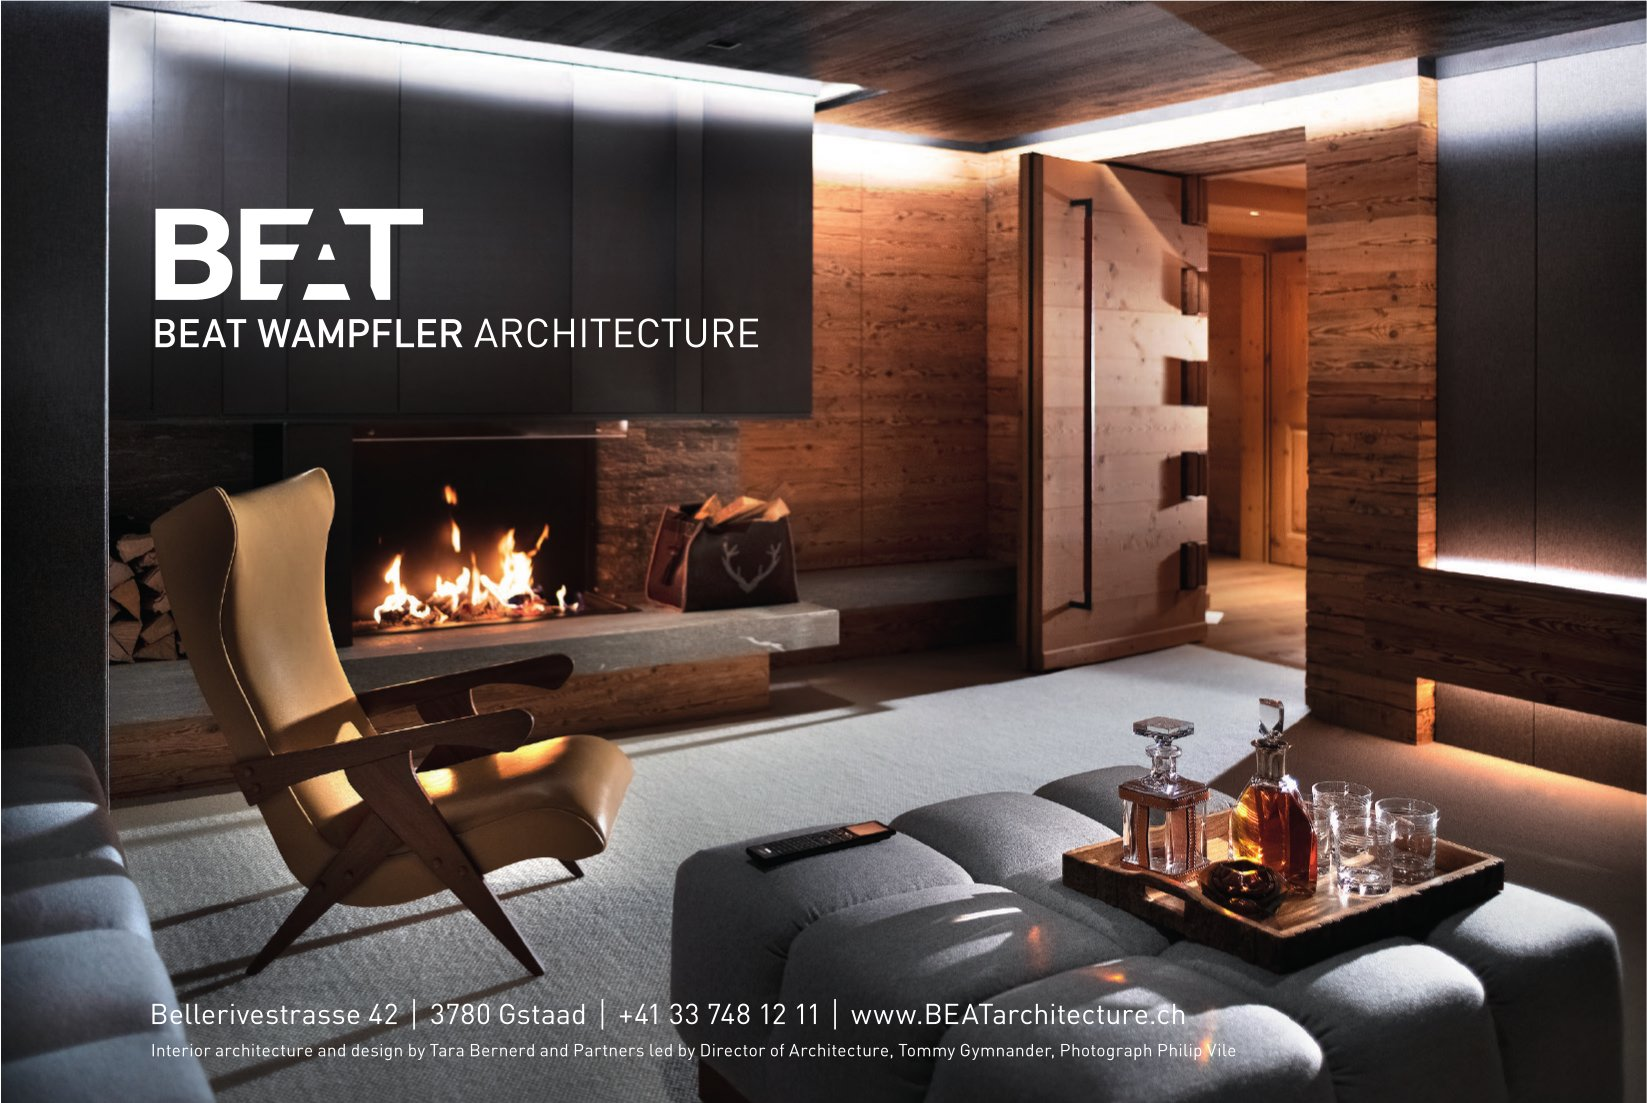 BEAT WAMPFLER ARCHITECTURE, GSTAAD